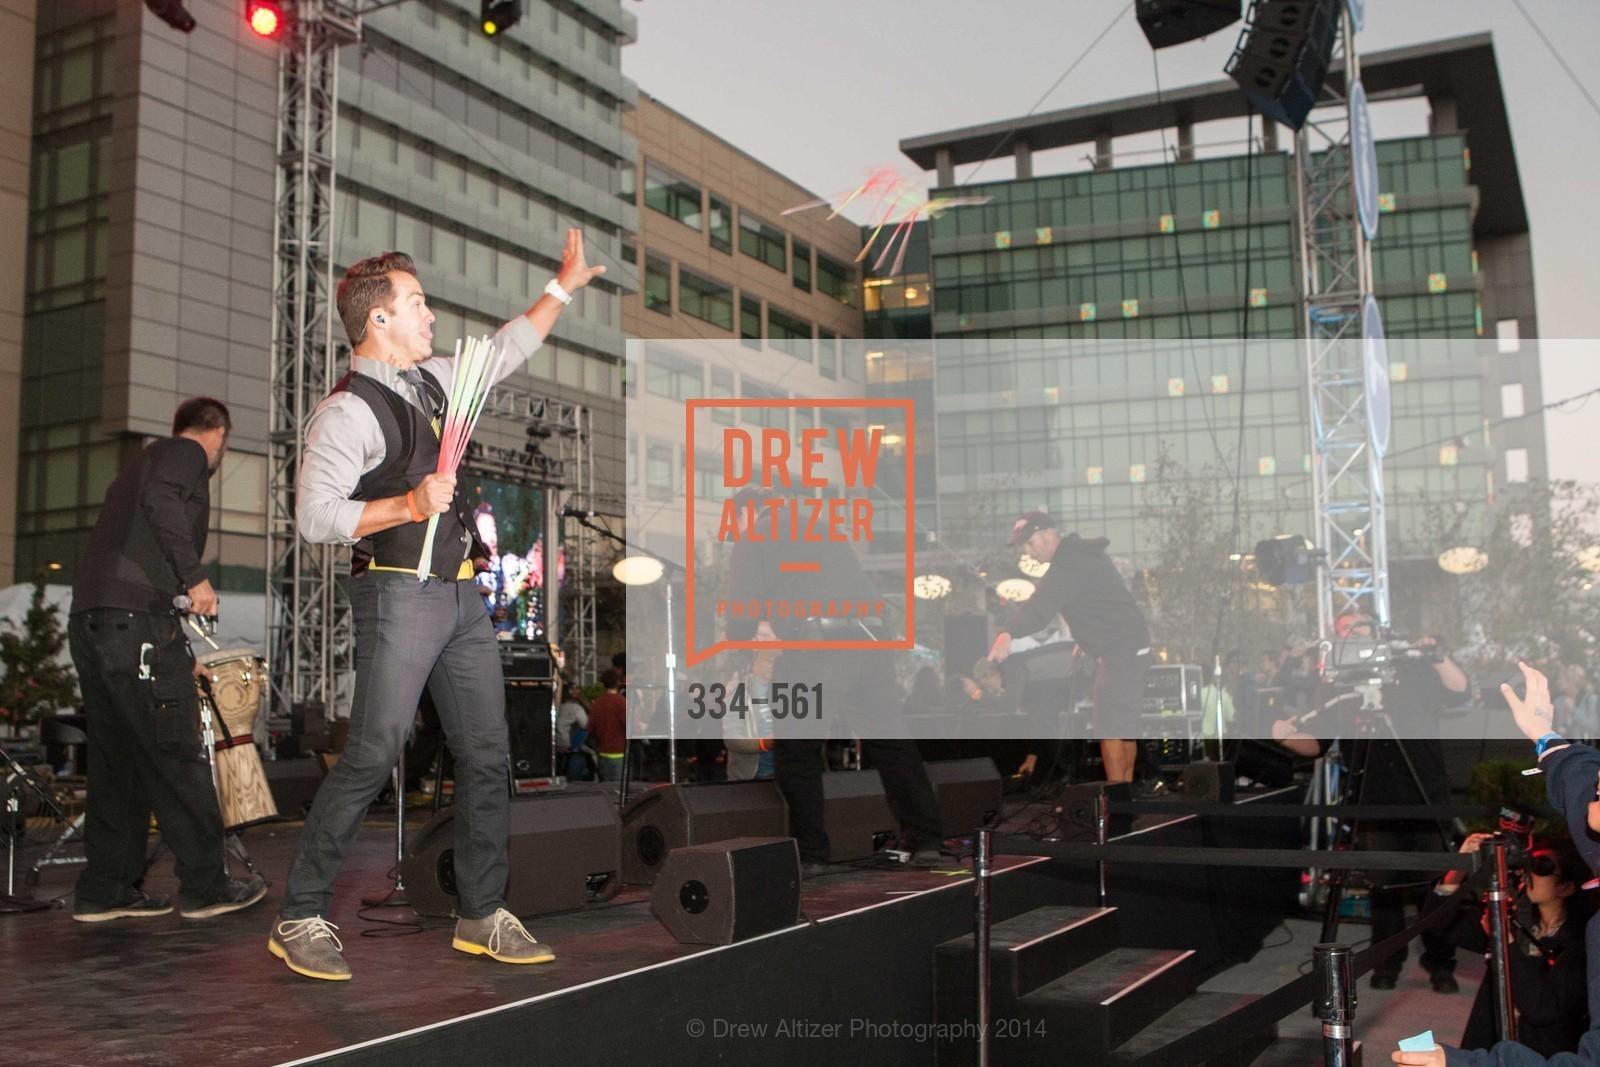 Performance By DJ Cory Live!, UCSF Medical Center HARD HAT WALK & LIGHTS ON FESTIVAL, US, September 6th, 2014